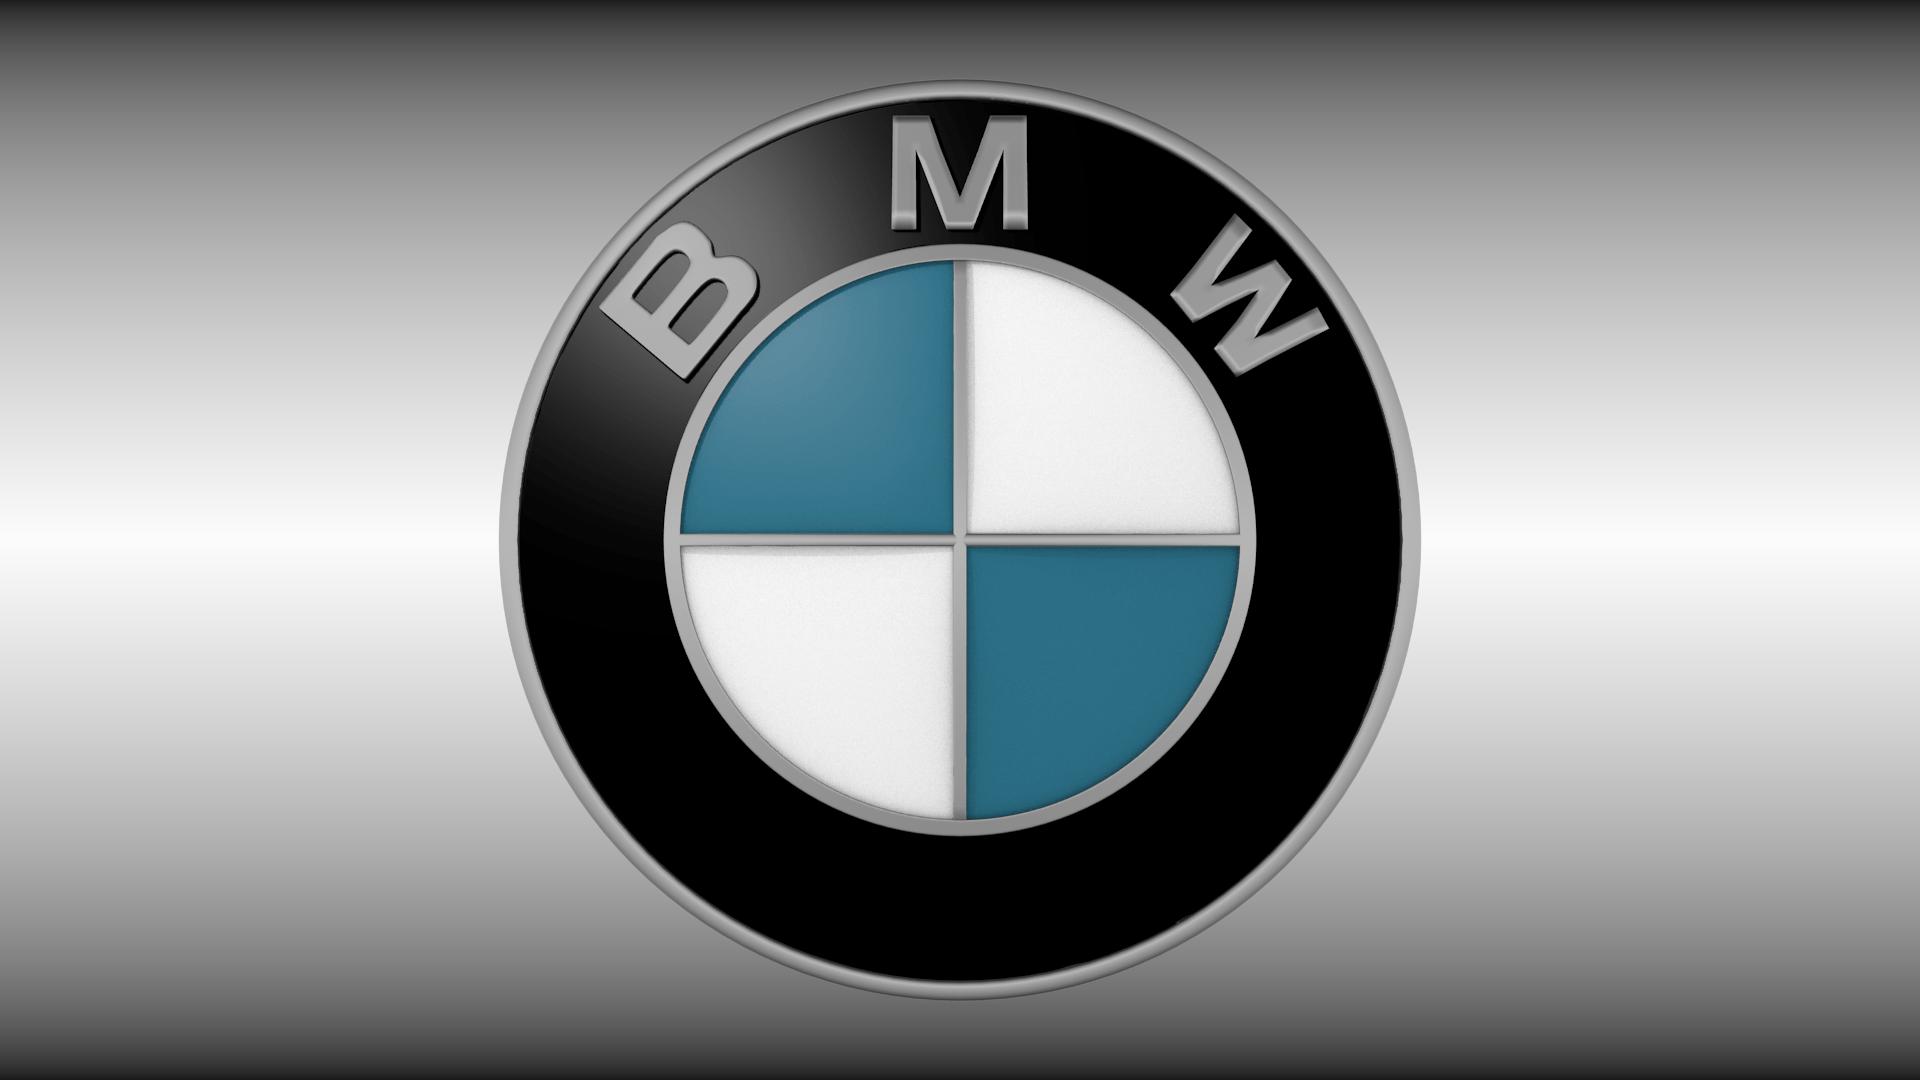 Logo BMW Wallpapers - Wallpaper Cave